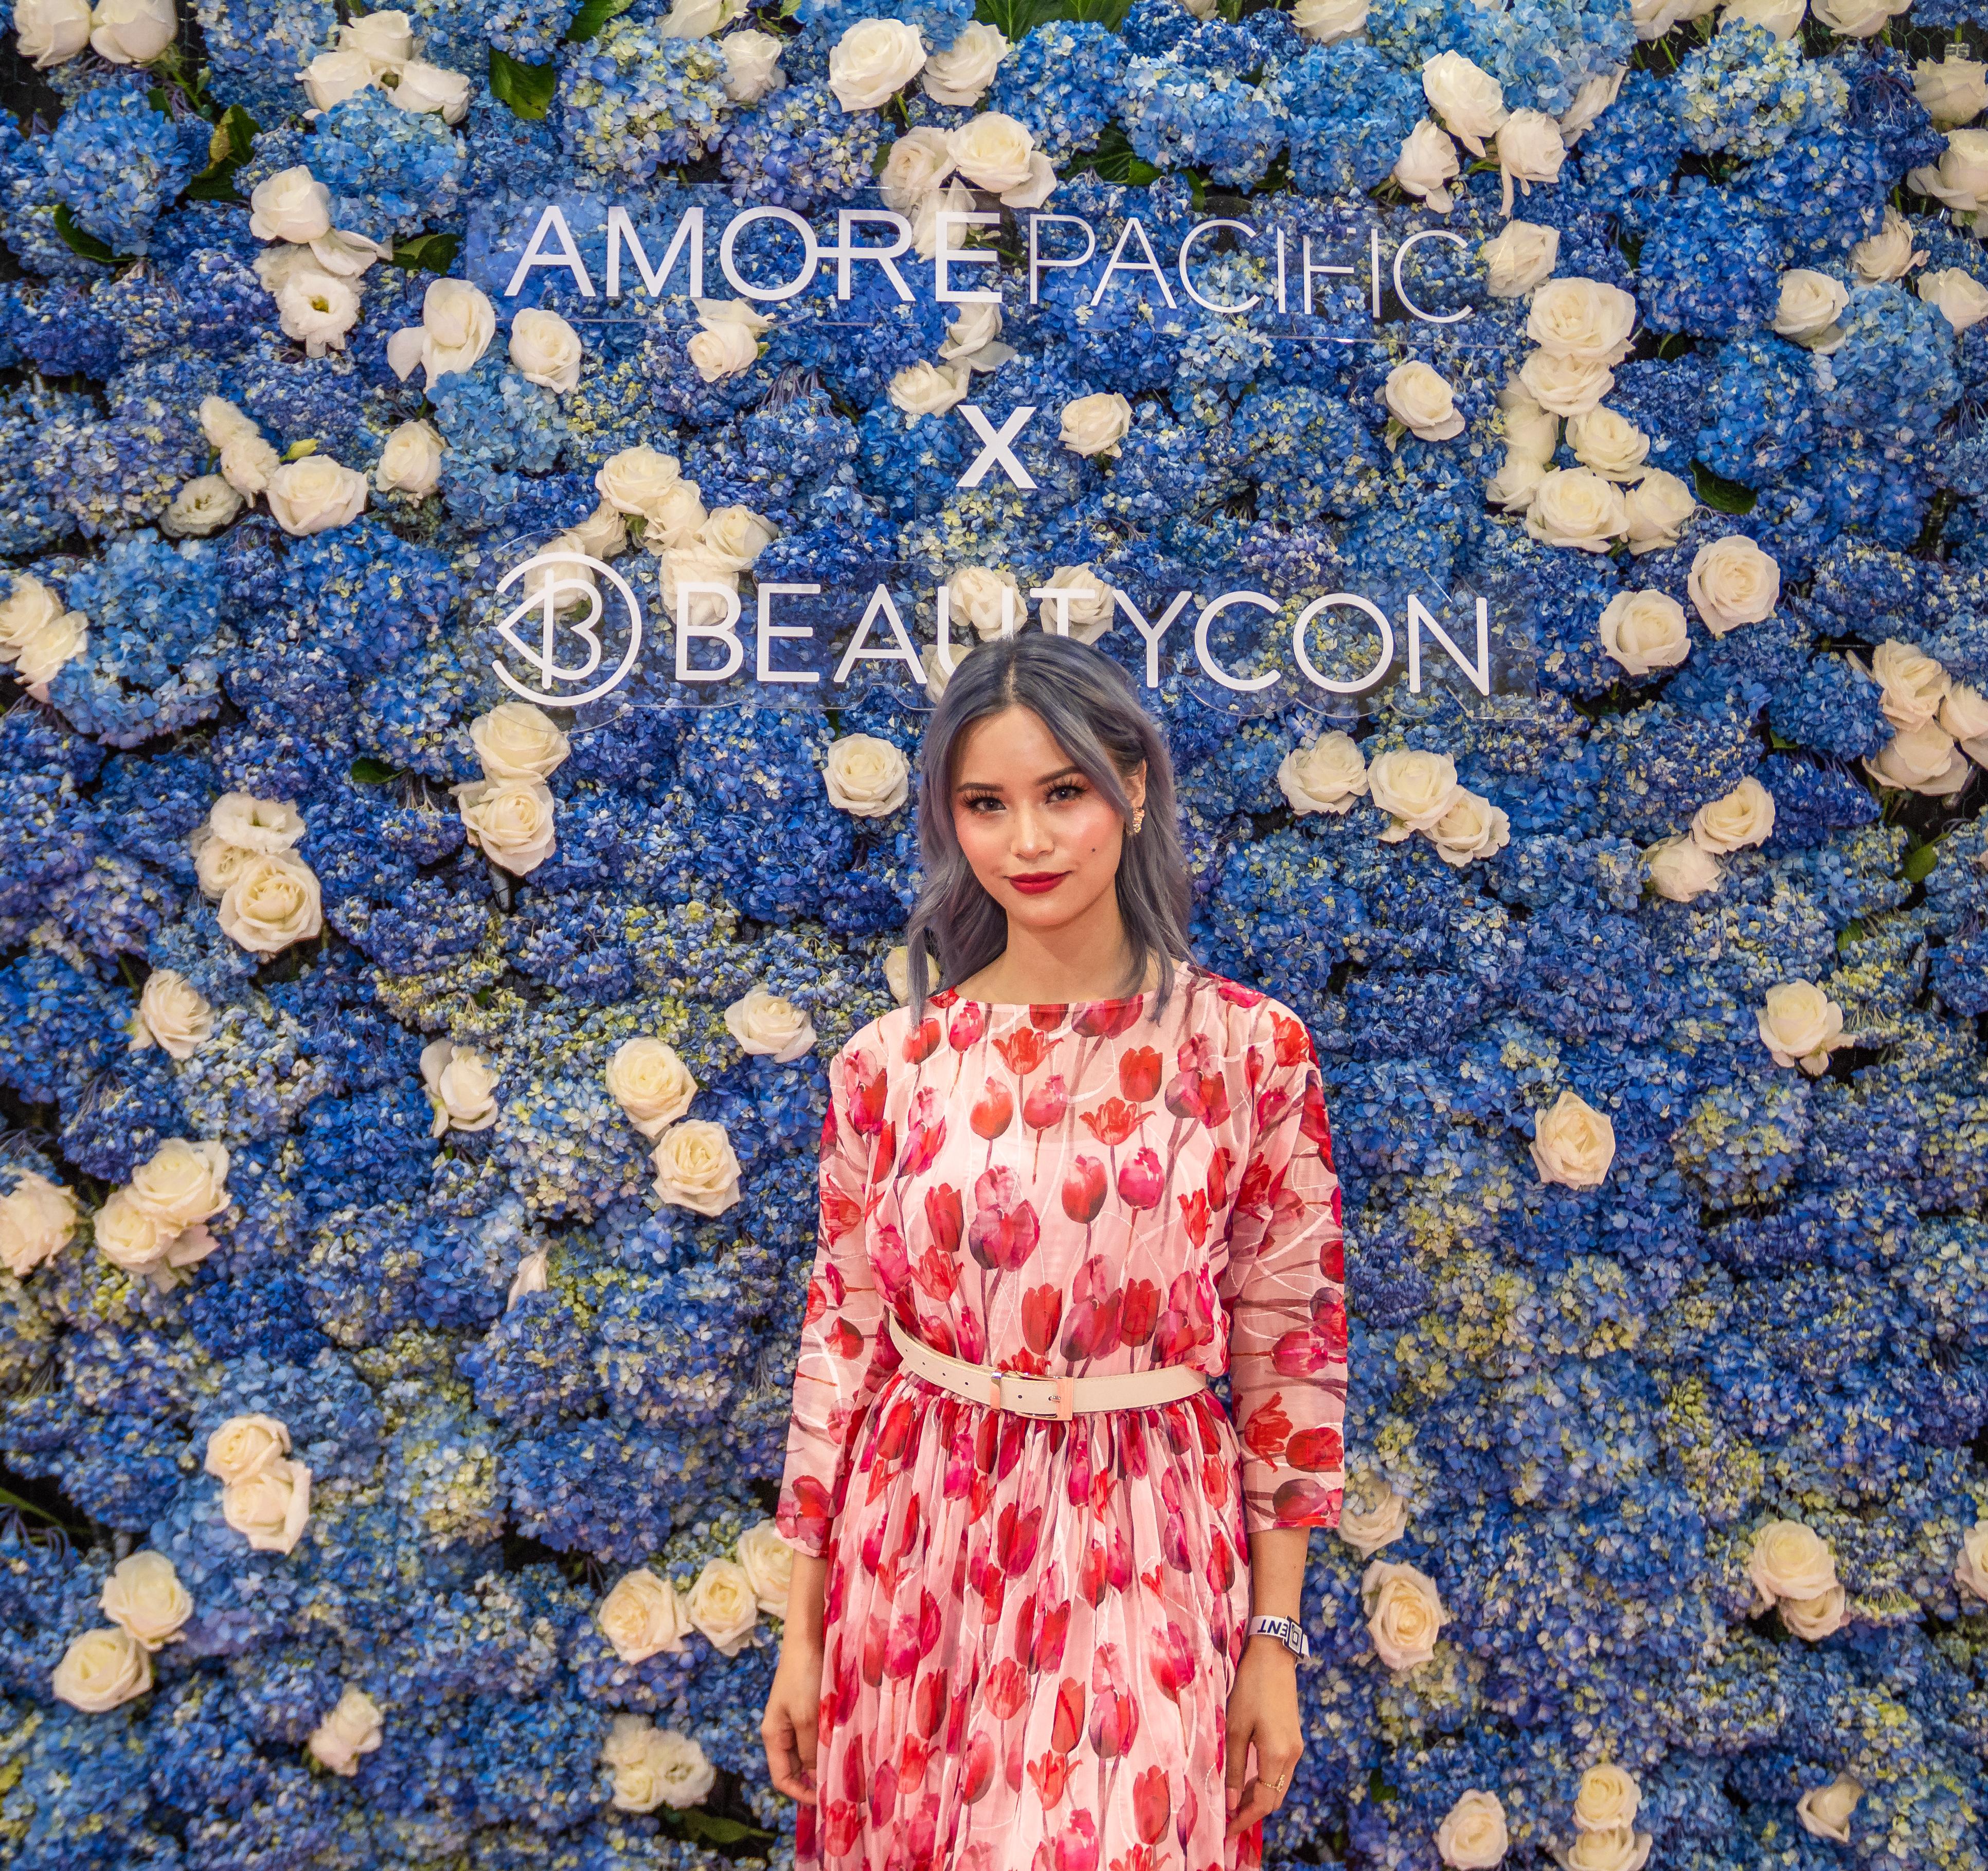 Beautycon LA 2018 Yukibomb Amore Pacific Booth